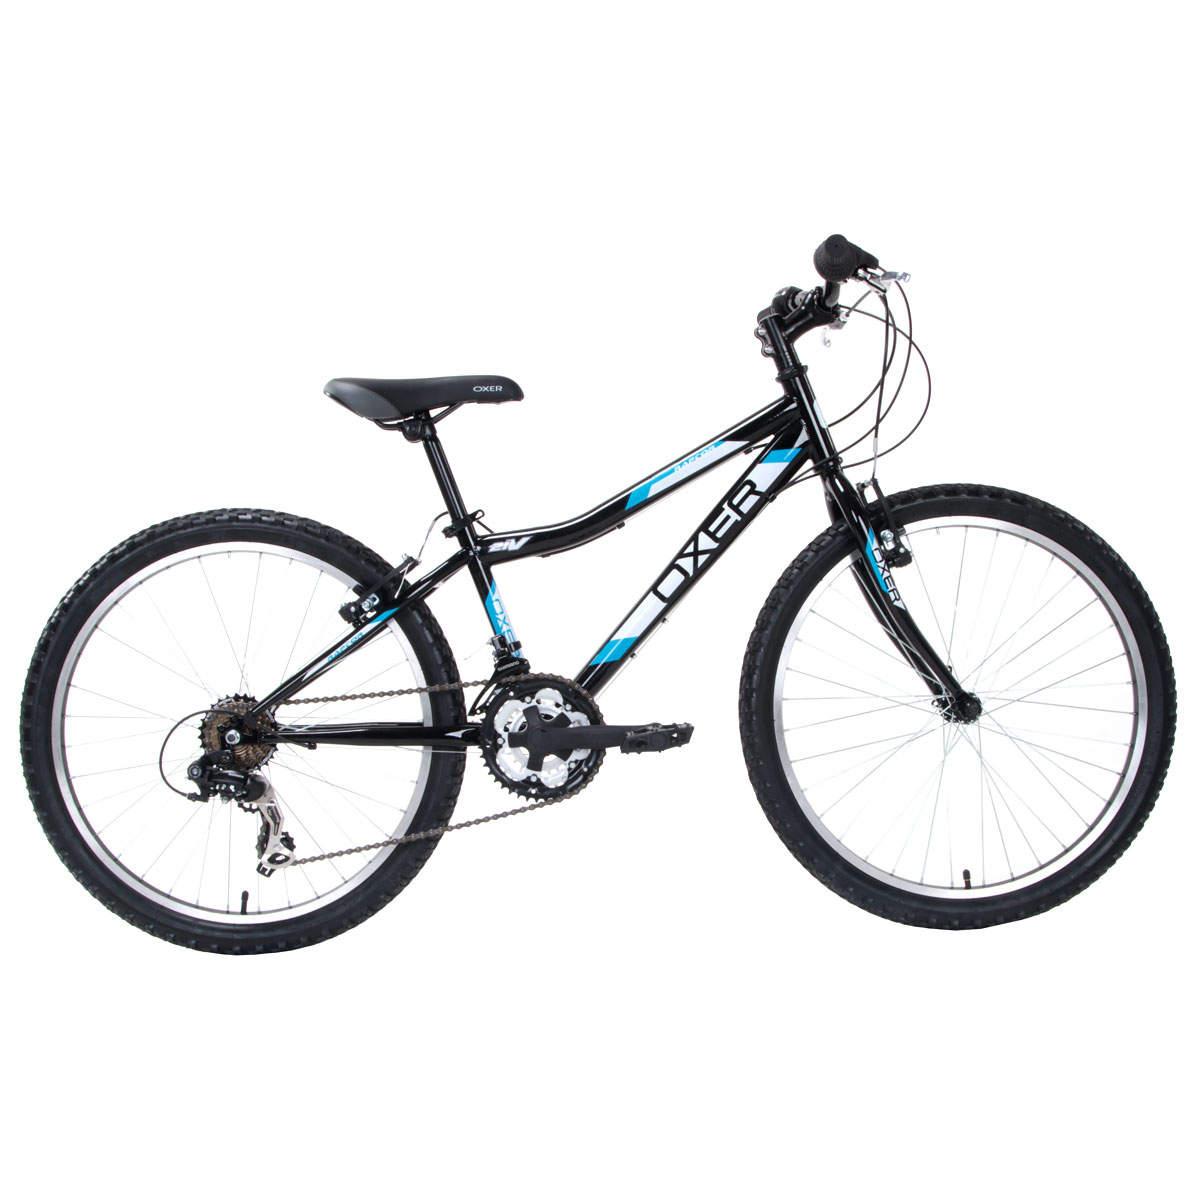 Bicicleta Oxer Raptor Aro 24 Rígida 21 Marchas - Azul/preto